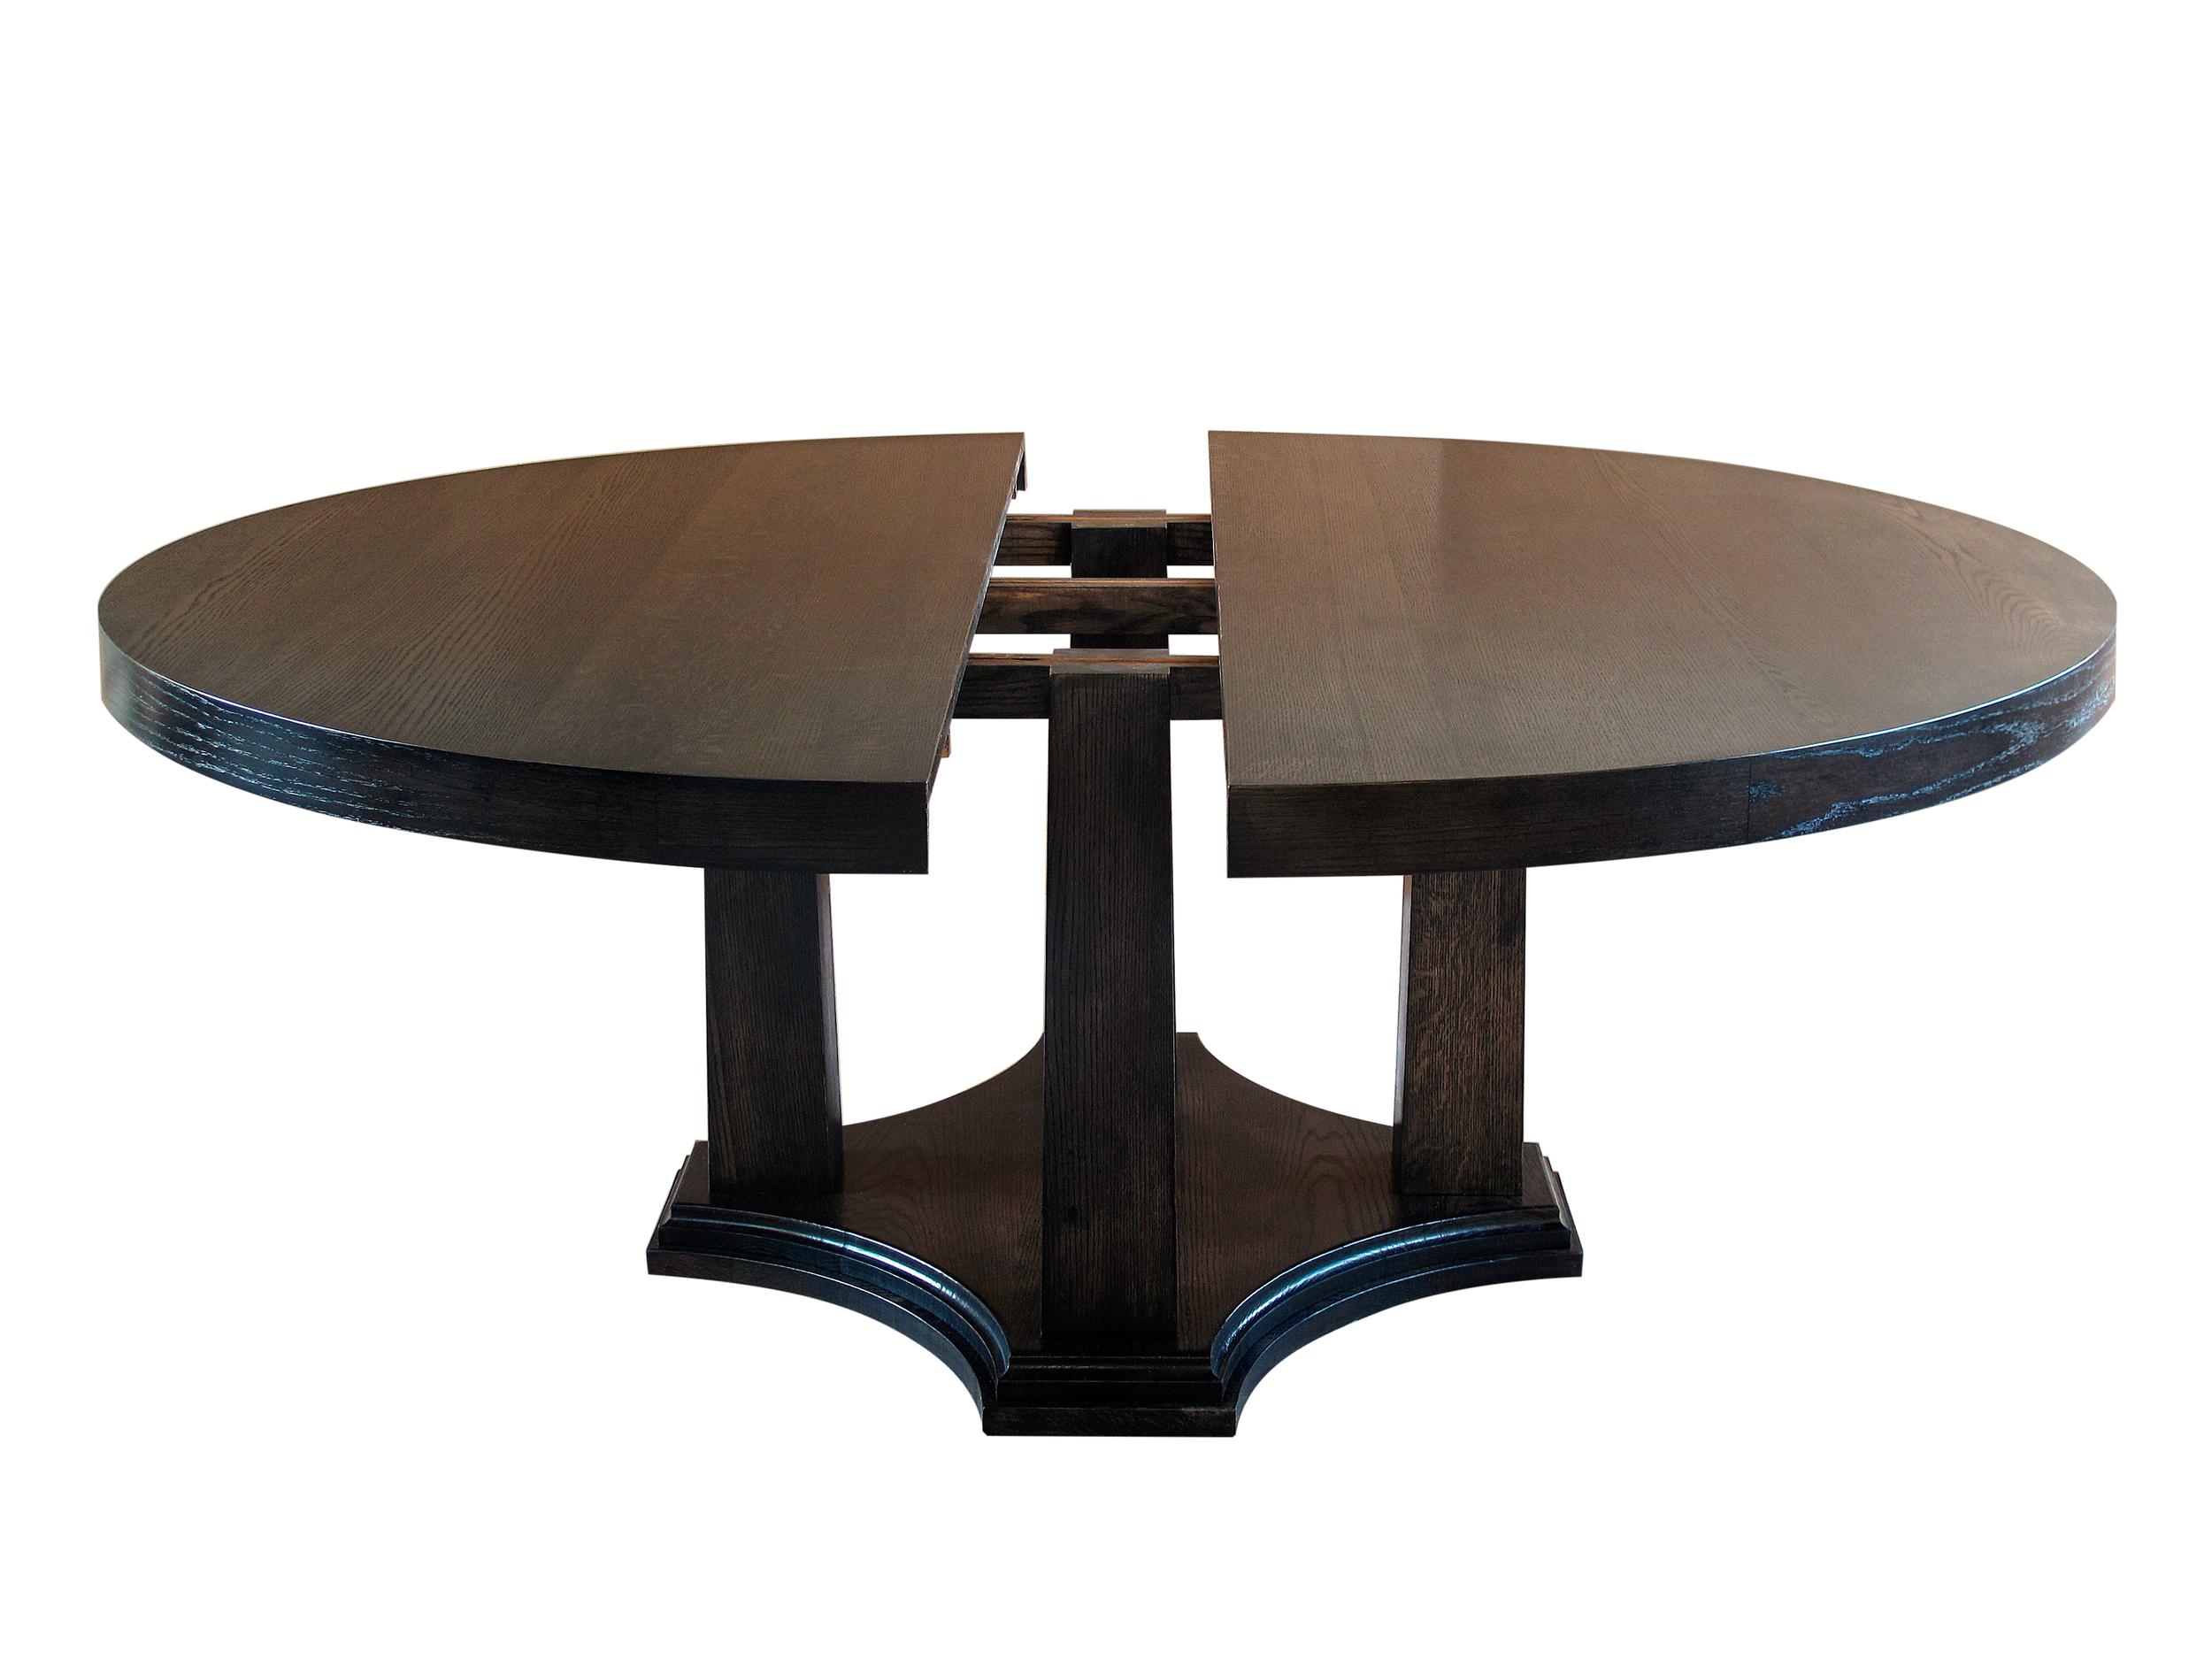 NEWKIRK Table